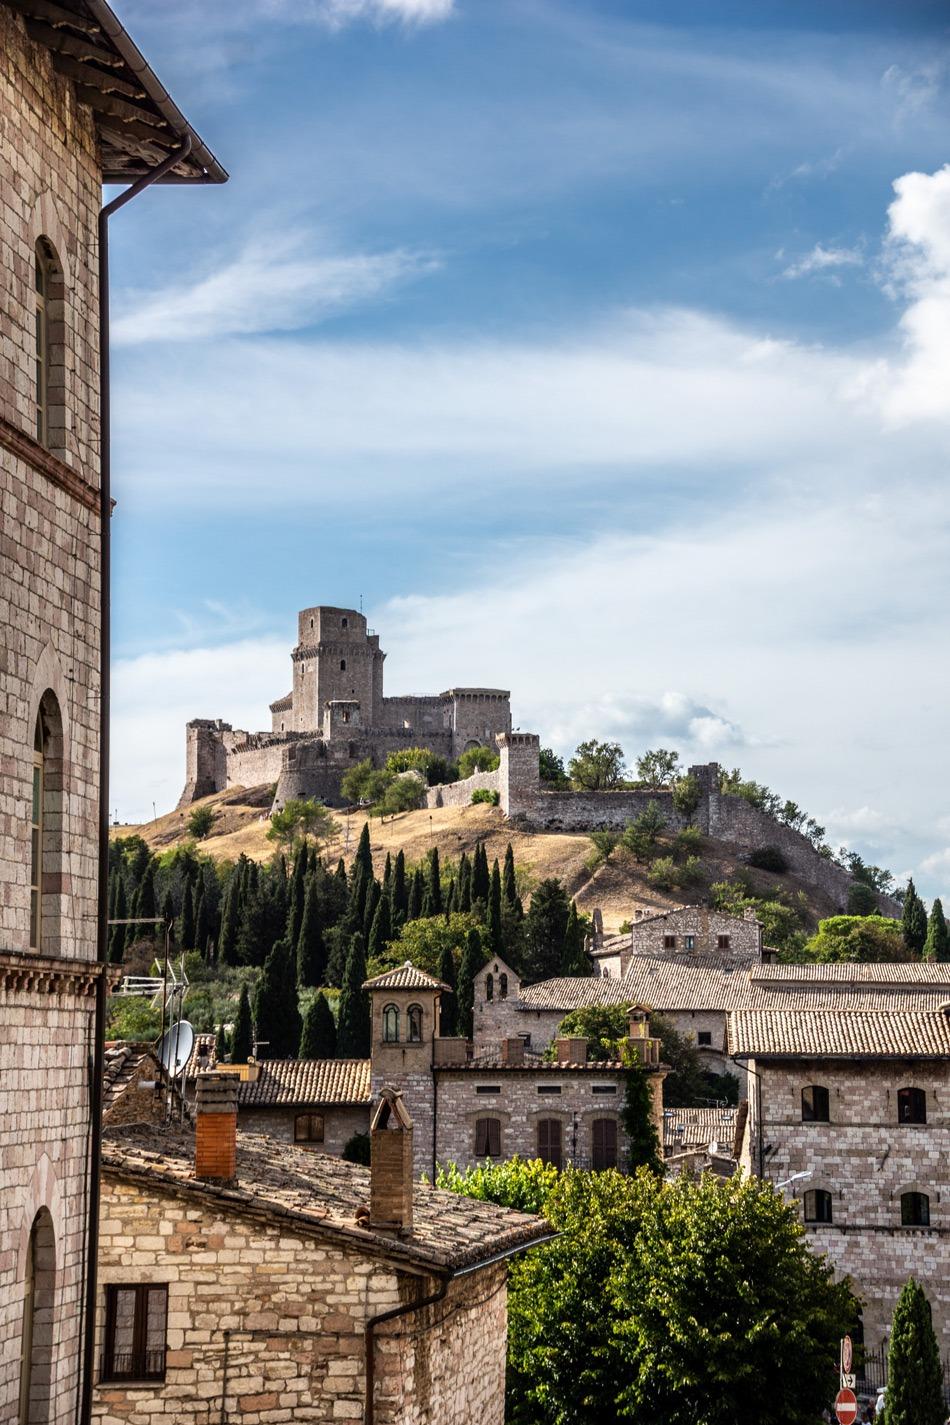 Urban Hiking in Perugia